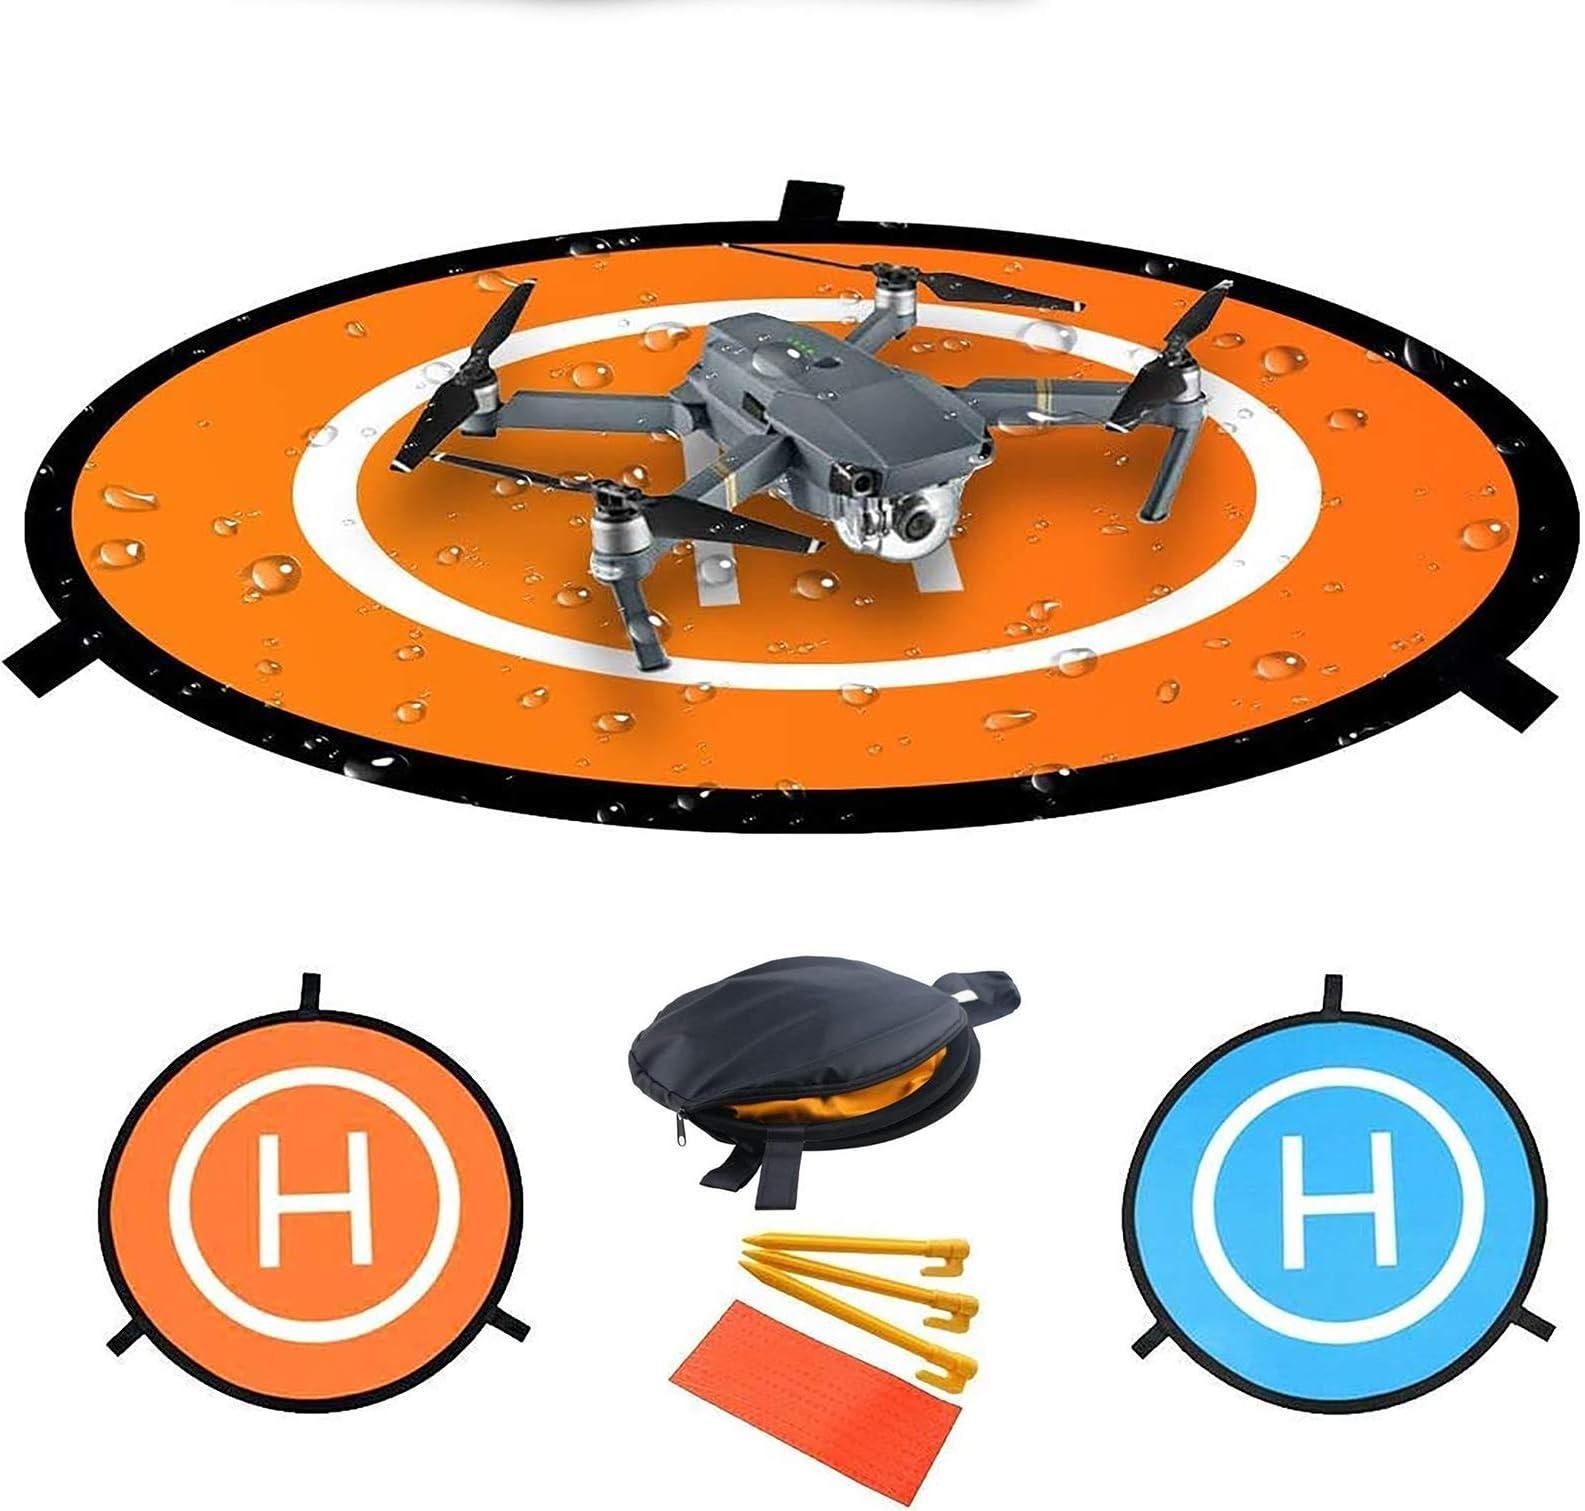 Fstop Labs Drone and Quadcopter Landing Pad Accessories 32 inch, Waterproof Nylon for DJI Tello Mavic Phantom 3 4 Spark Mavic 2 Pro Zoom Air